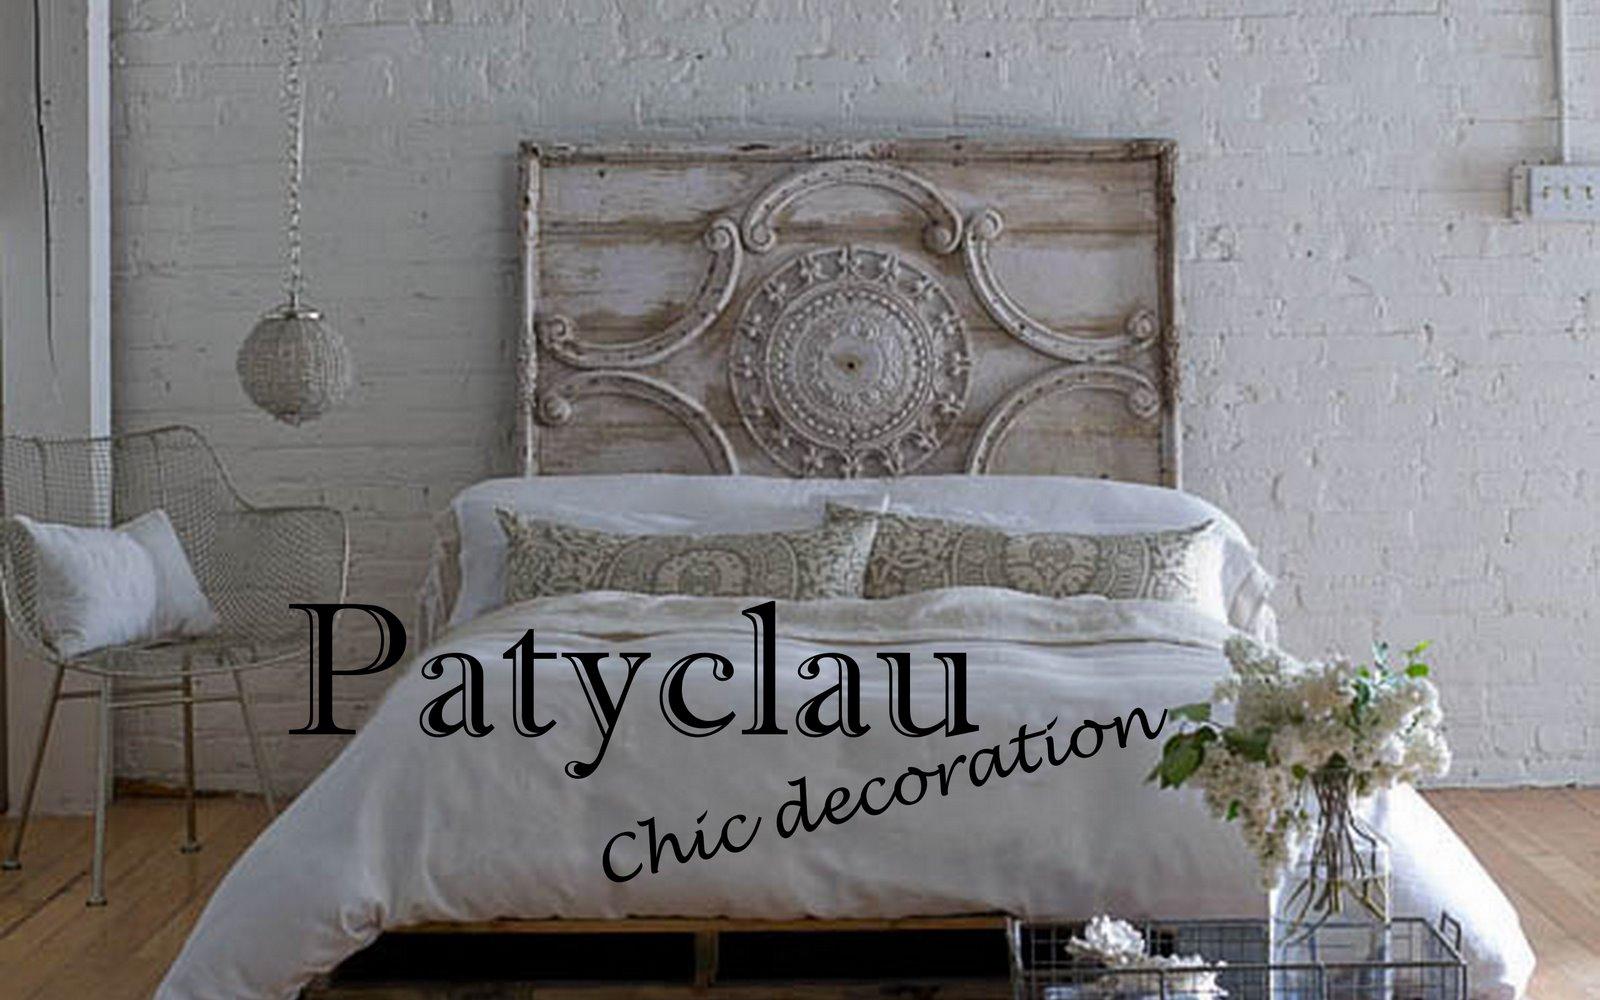 Patyclau DECORACION